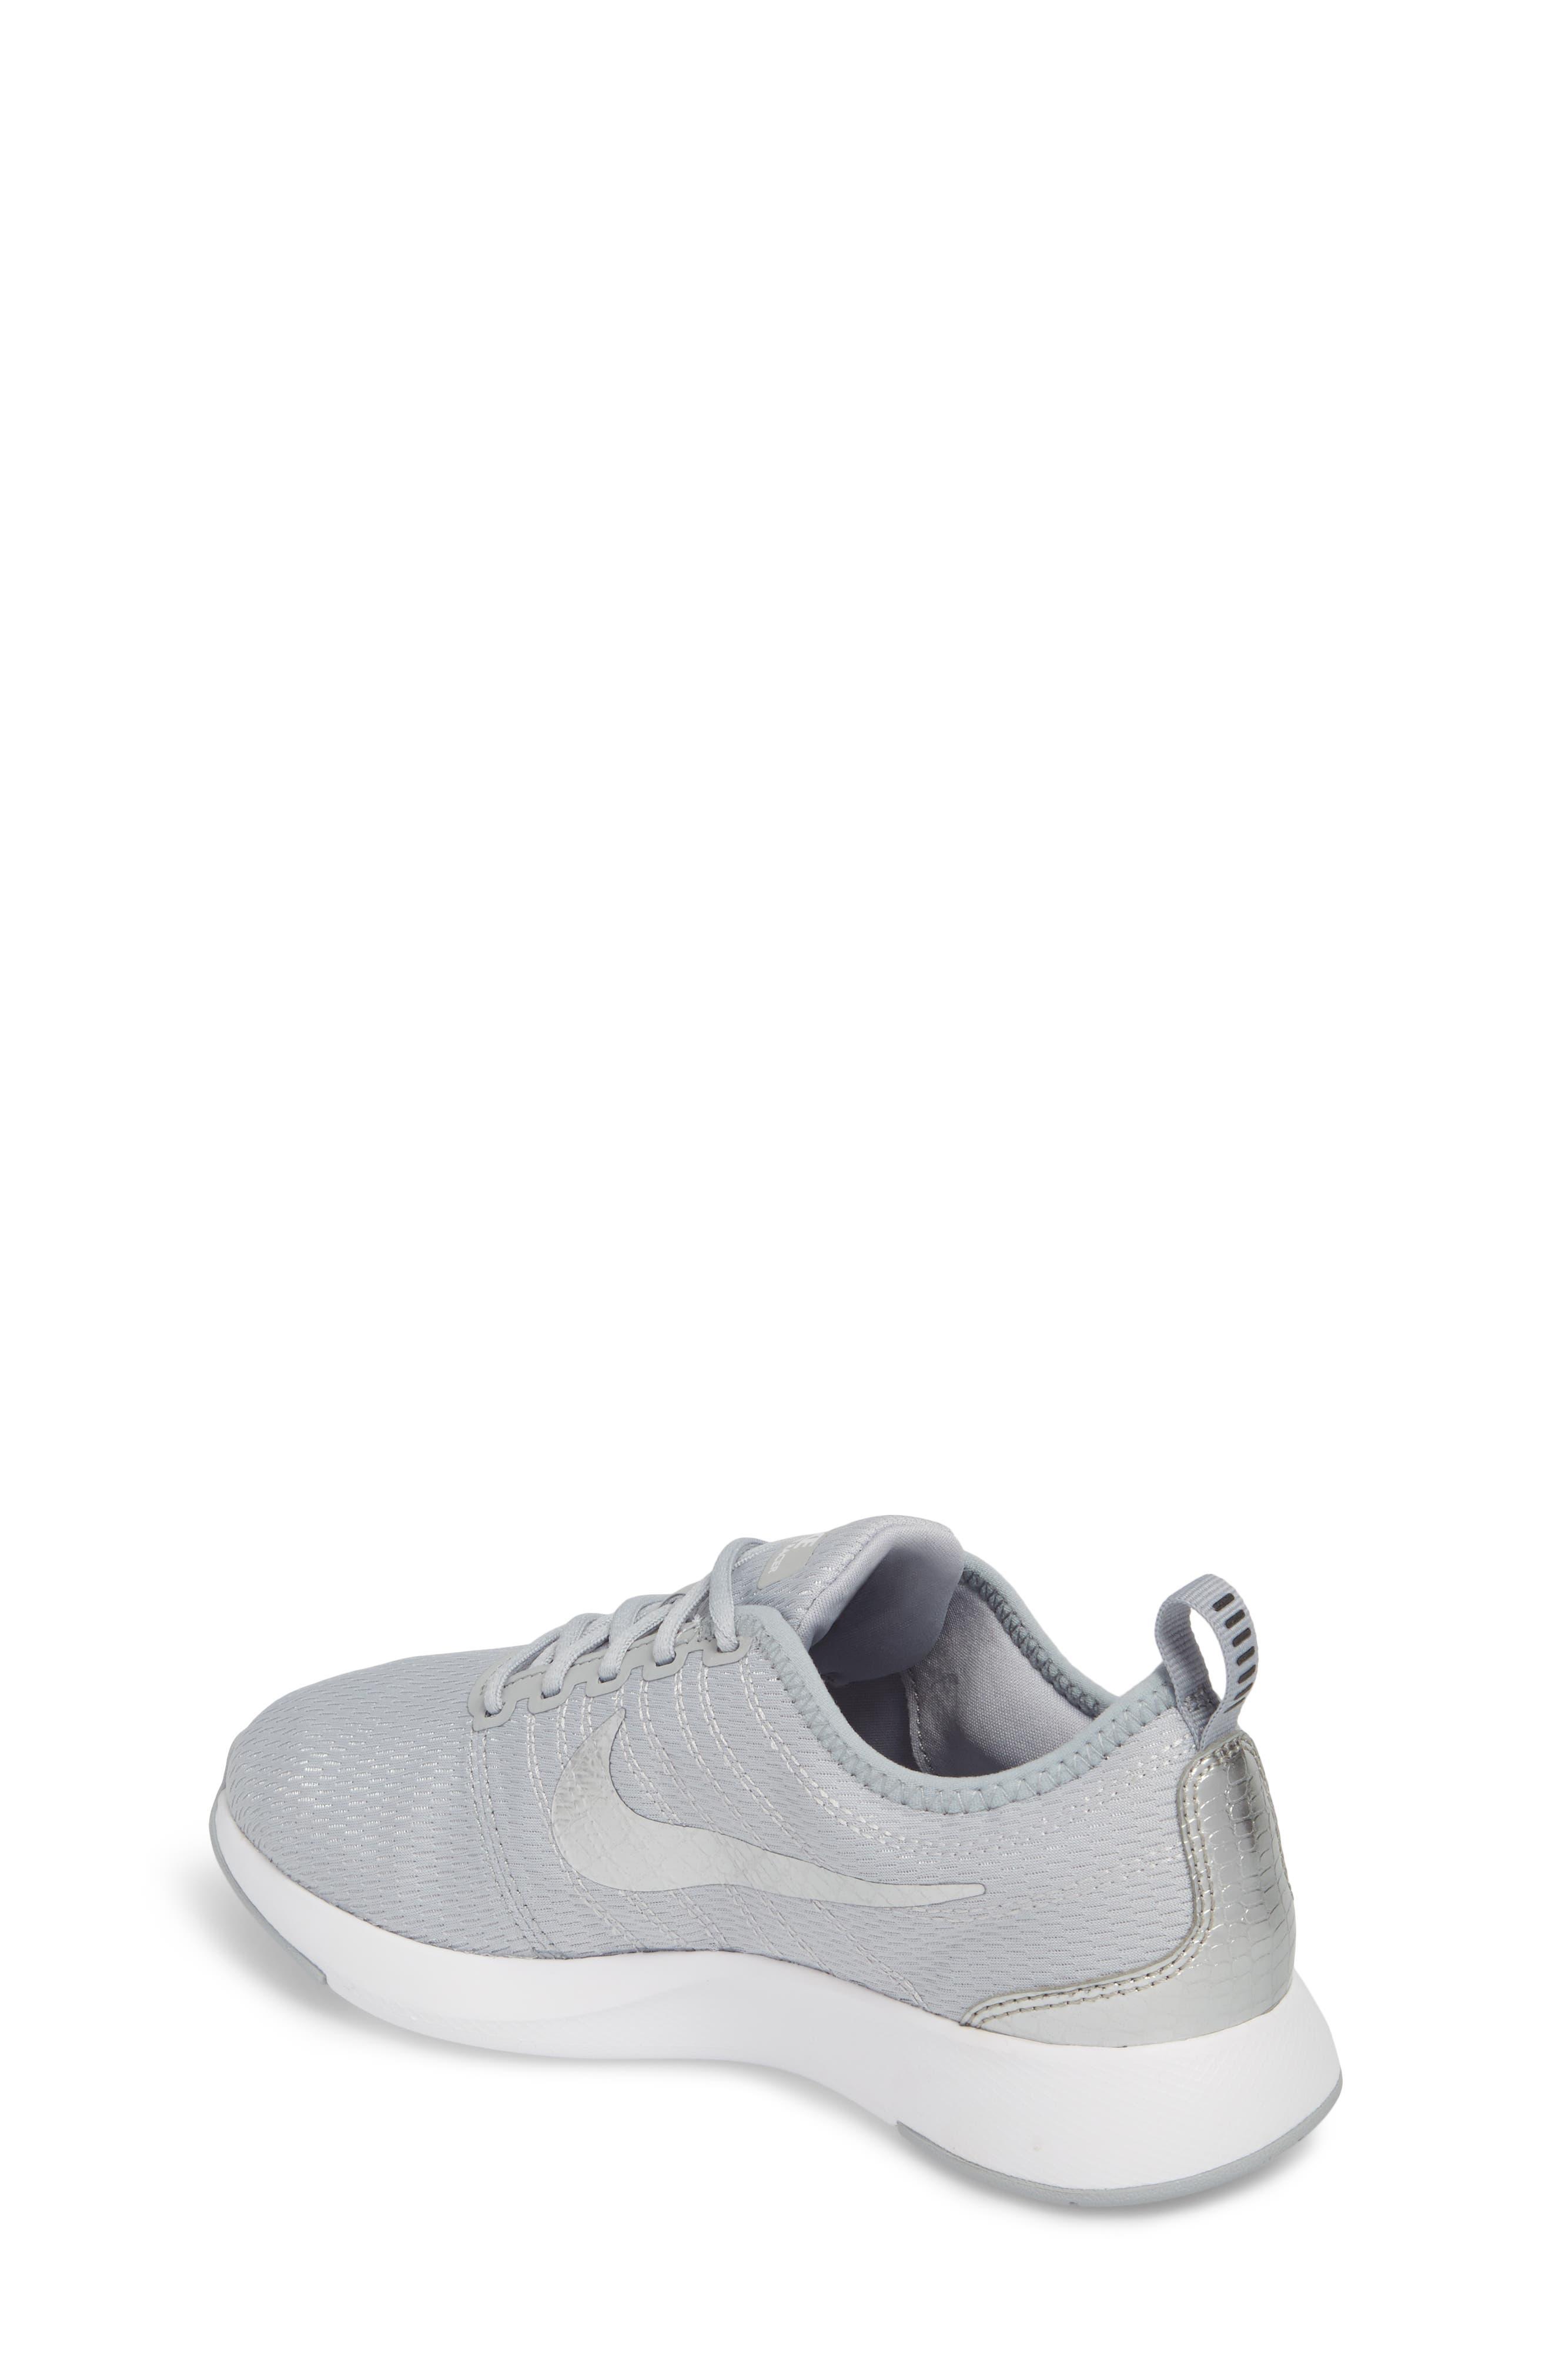 Dualtone Racer GS Sneaker,                             Alternate thumbnail 6, color,